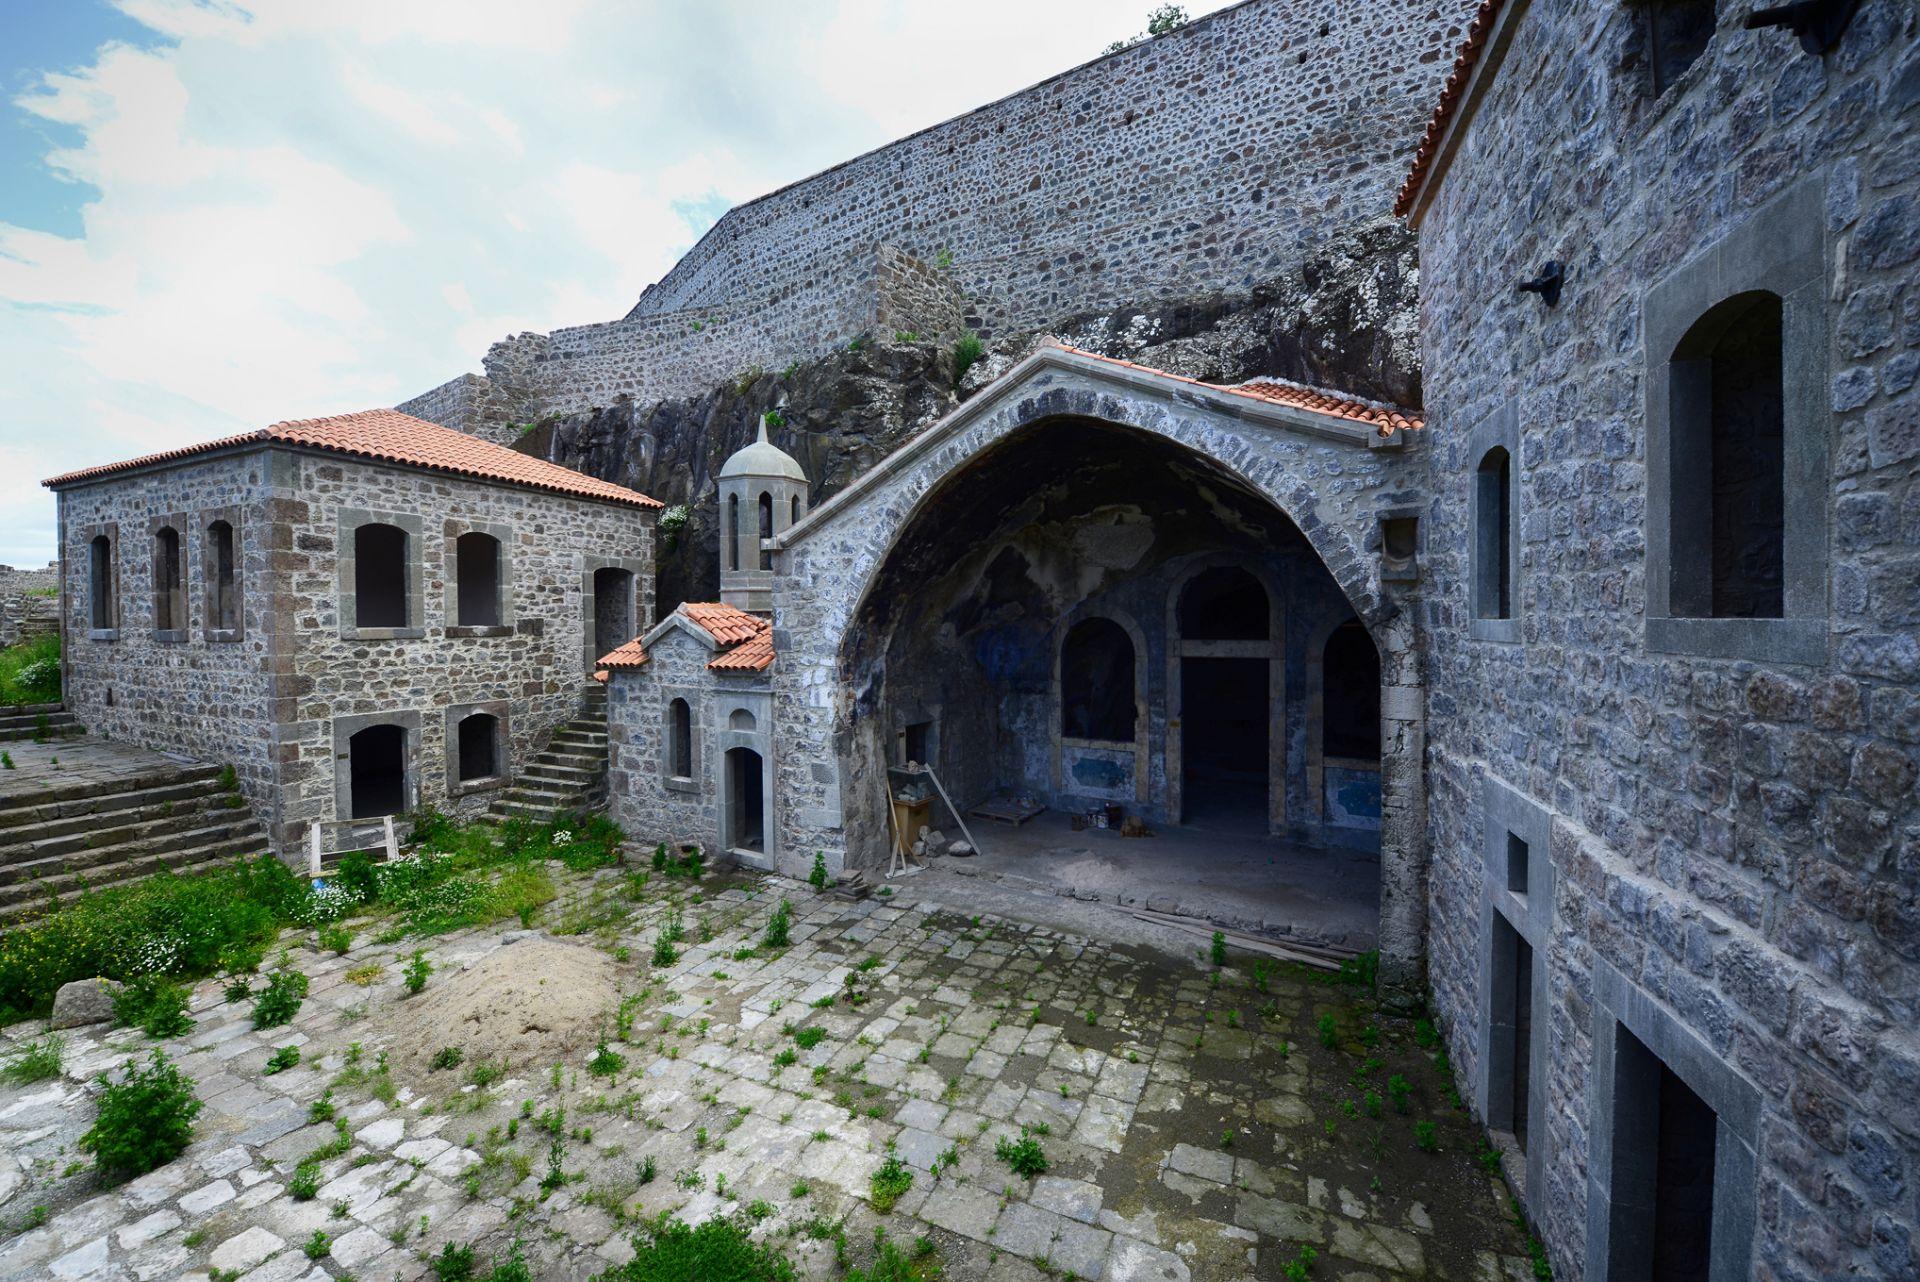 Kaymakli-Monastery معرفی بهترین جاذبه های گردشگری ترابزون ترکیه   قسمت دوم